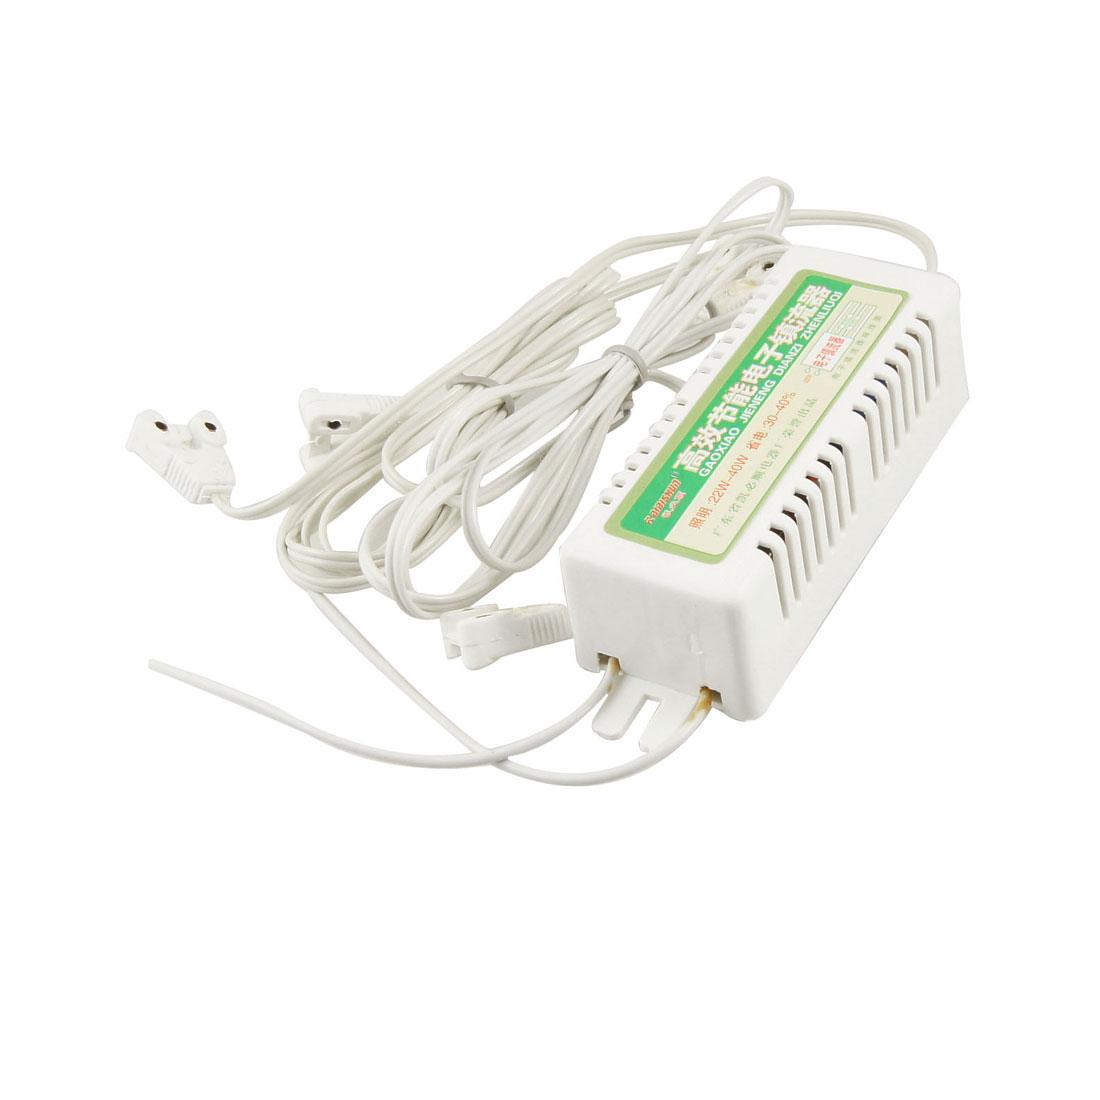 22-40W 220V Energy Saving Metal Fluorescent Lamp Ballast